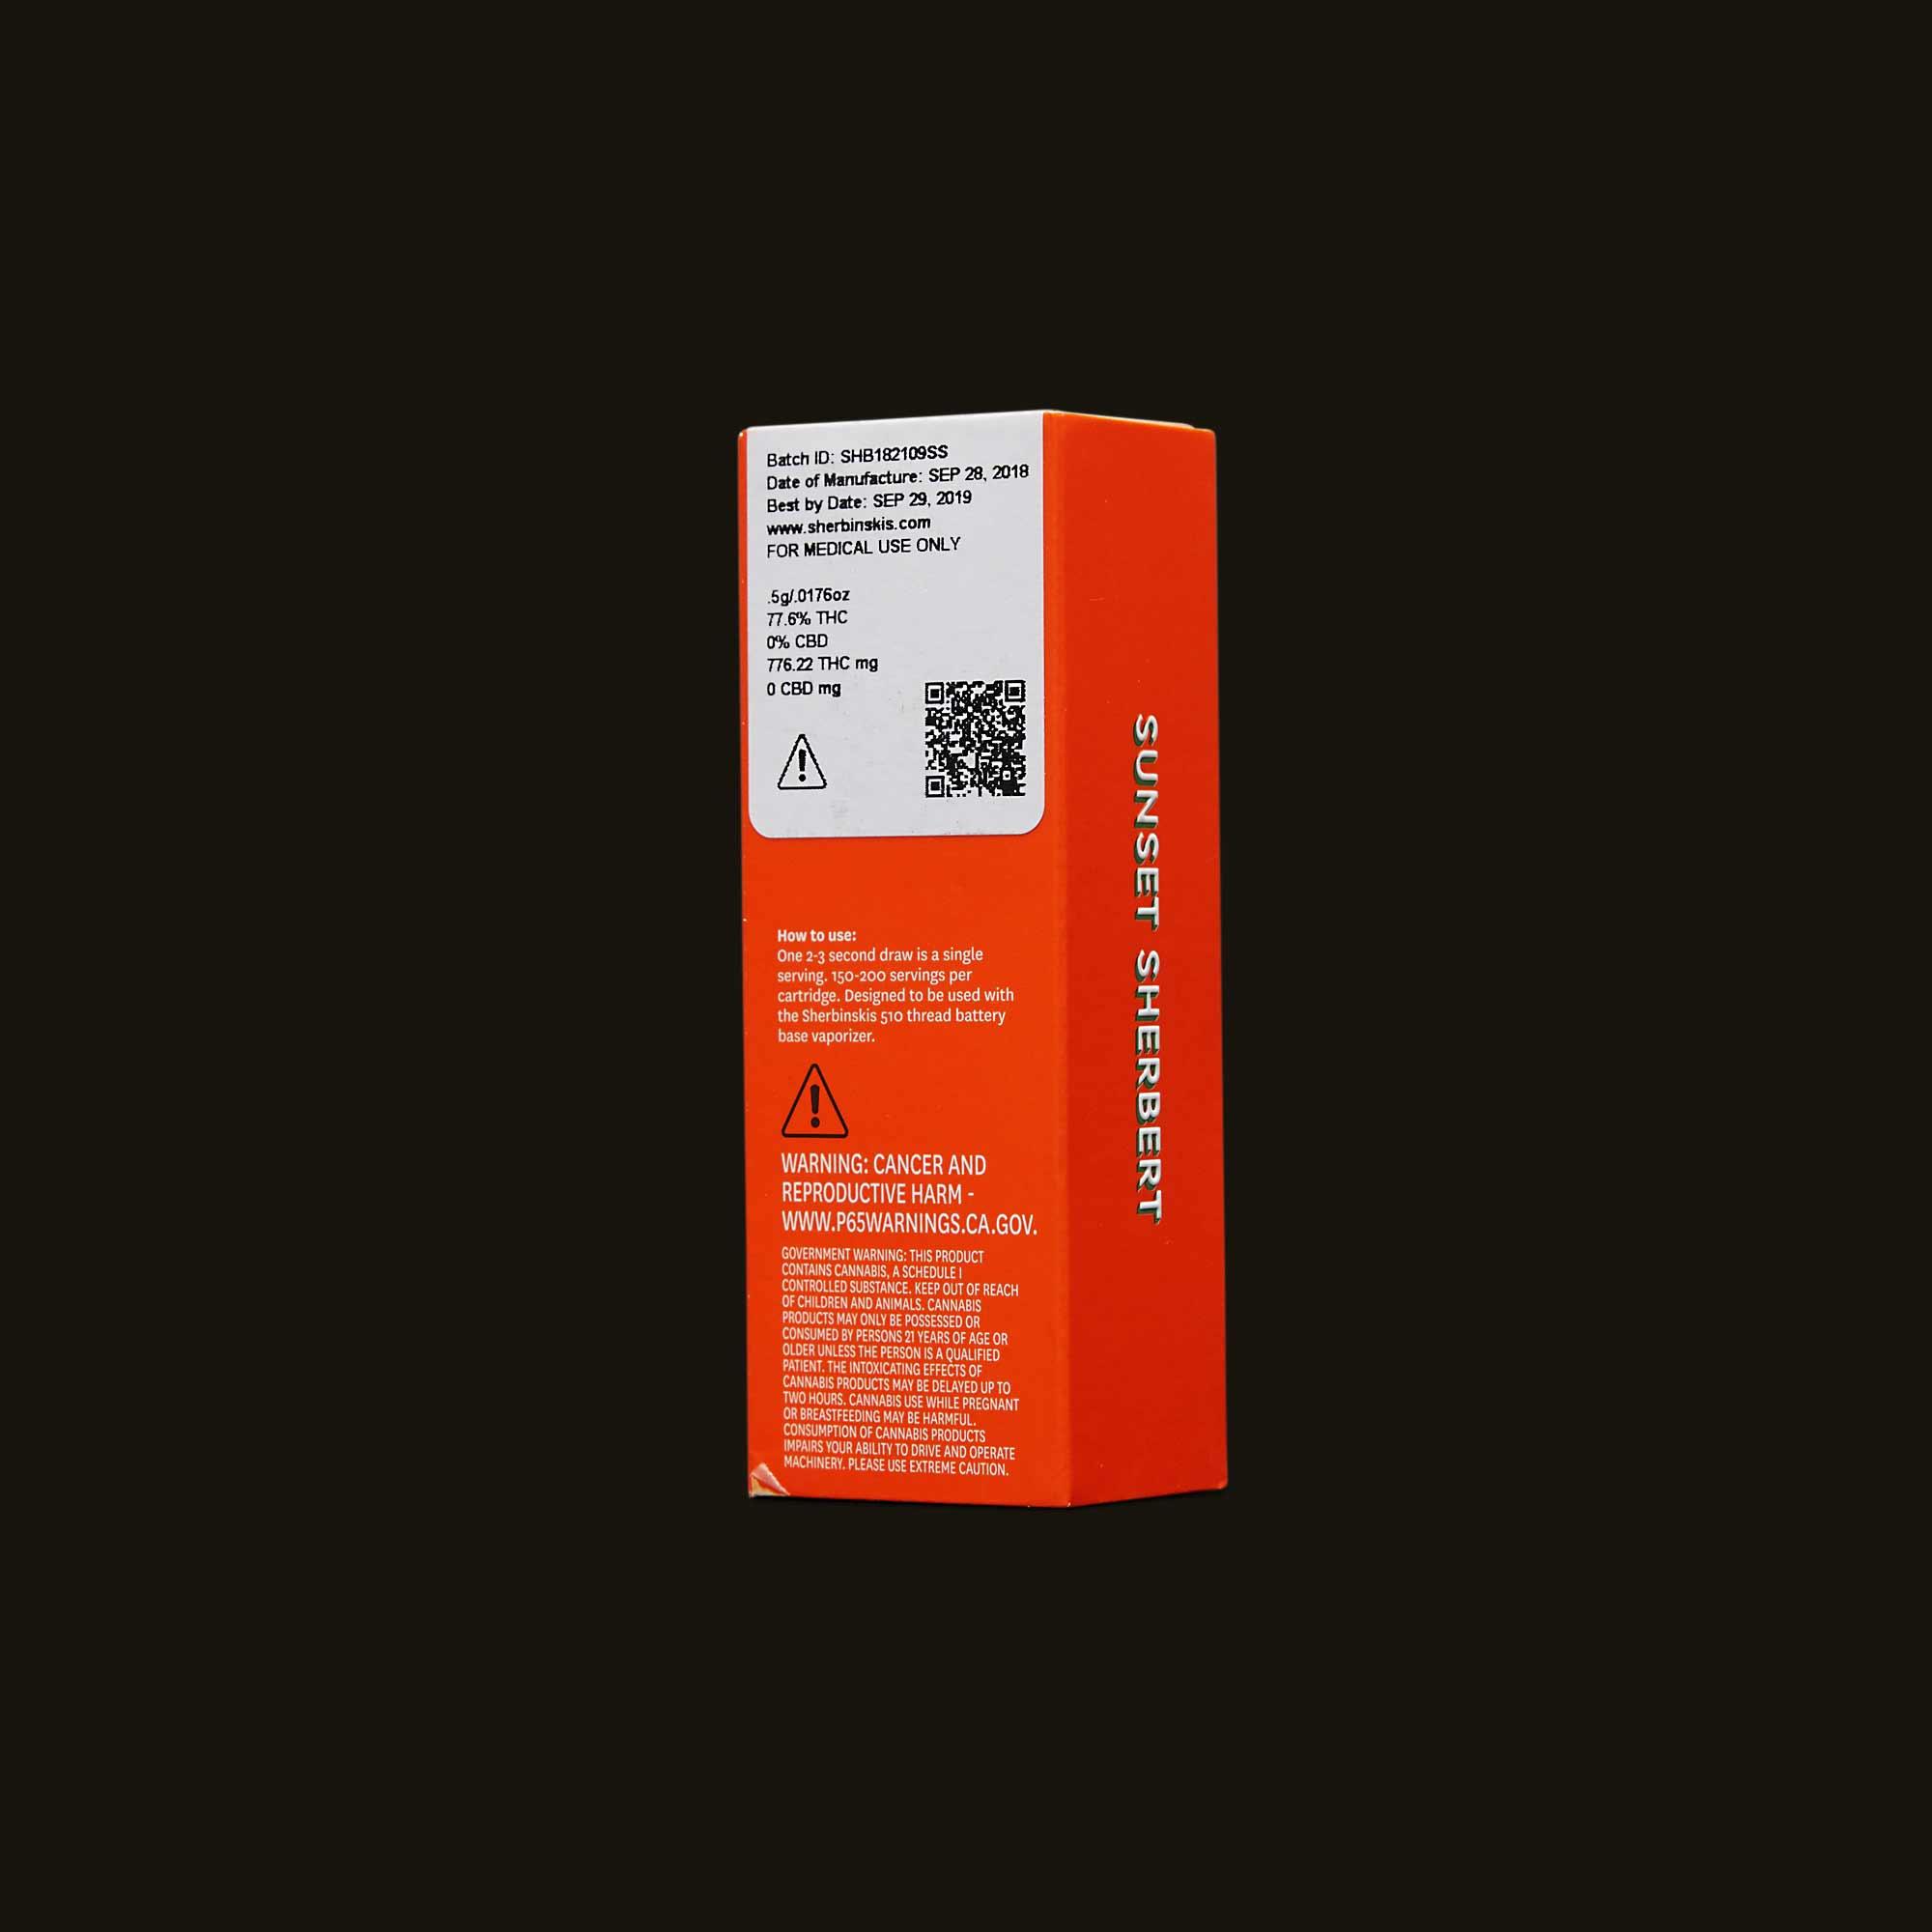 Sherbinskis Vape Pen - Sunset Sherbert Cartridge